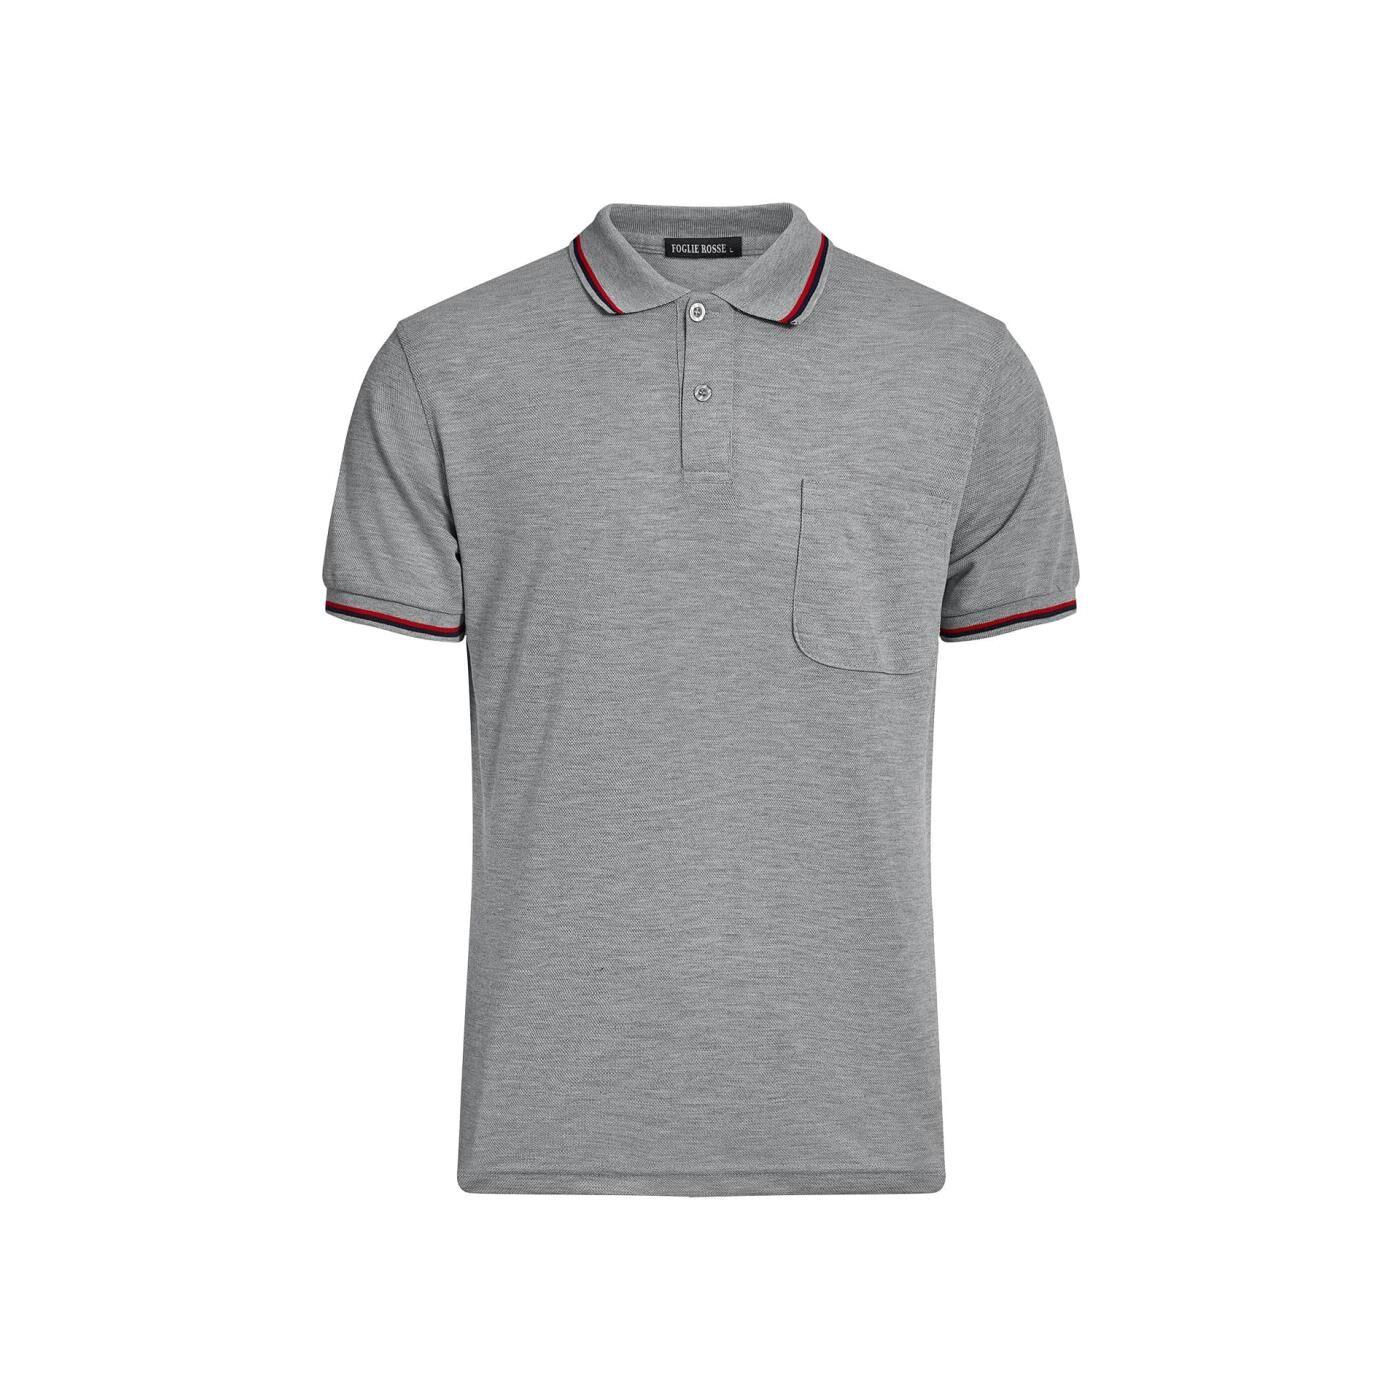 Celestino Ανδρική μπλούζα με γιακά  - Γκρι - Grootte: Medium